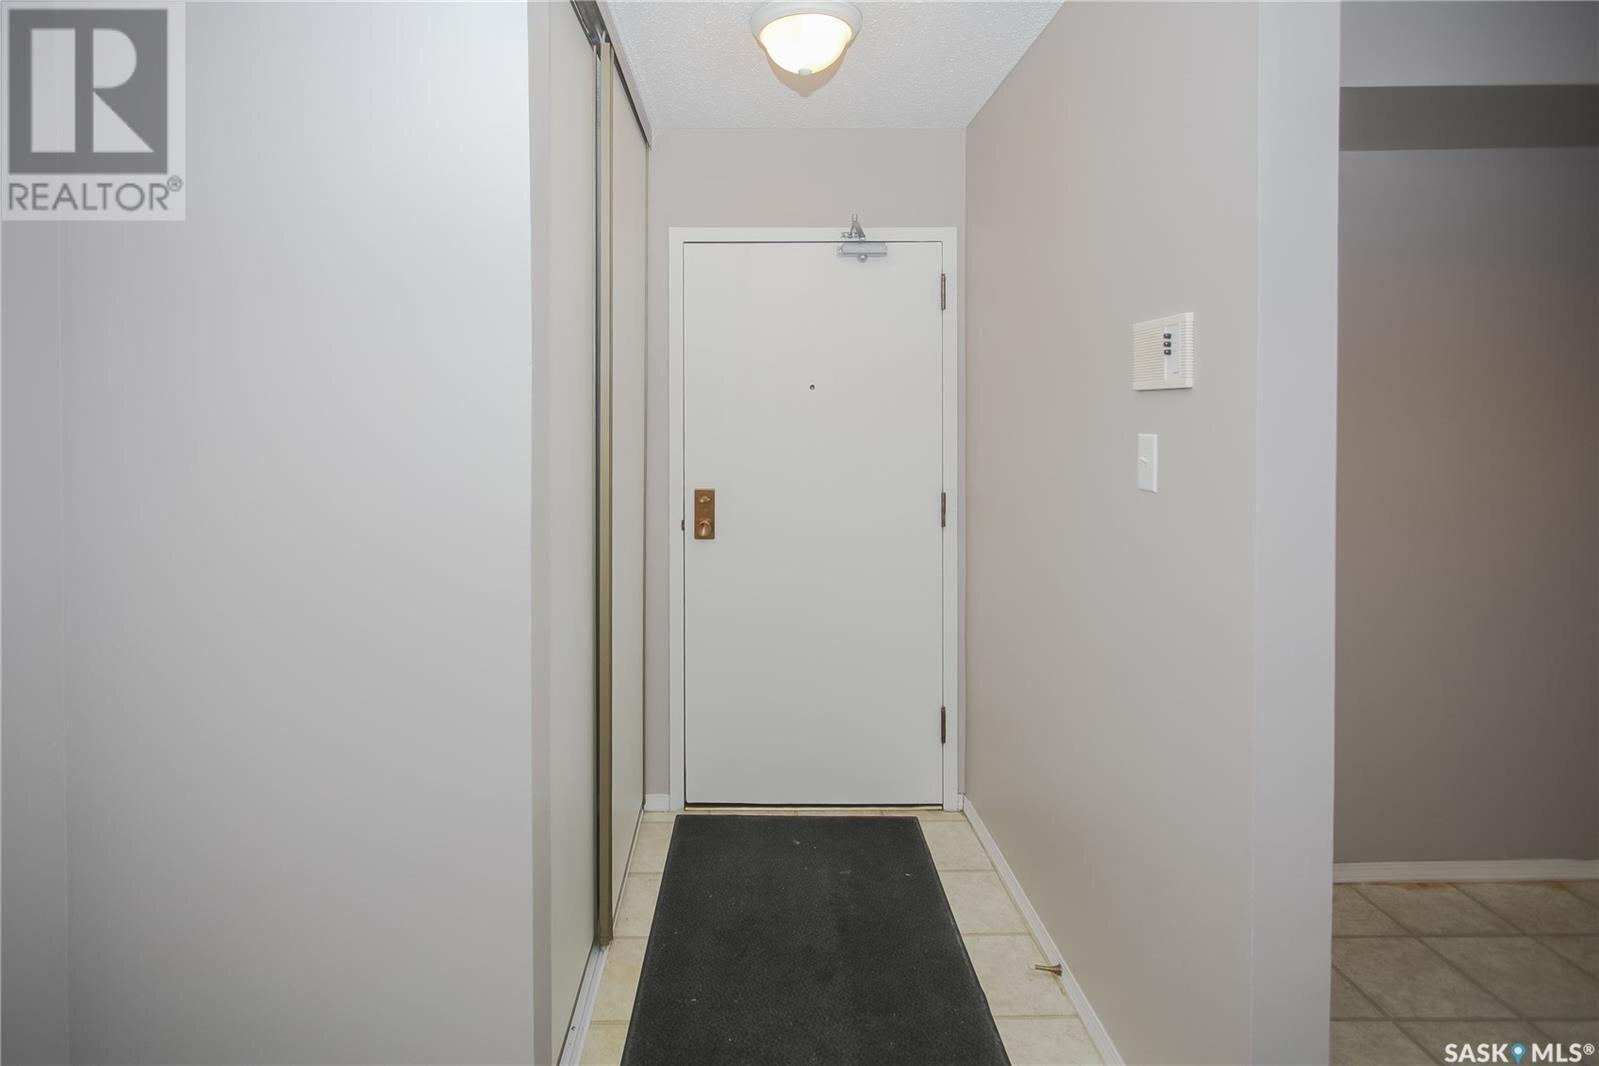 Condo for sale at 411 Tait Ct Unit 101 Saskatoon Saskatchewan - MLS: SK834232